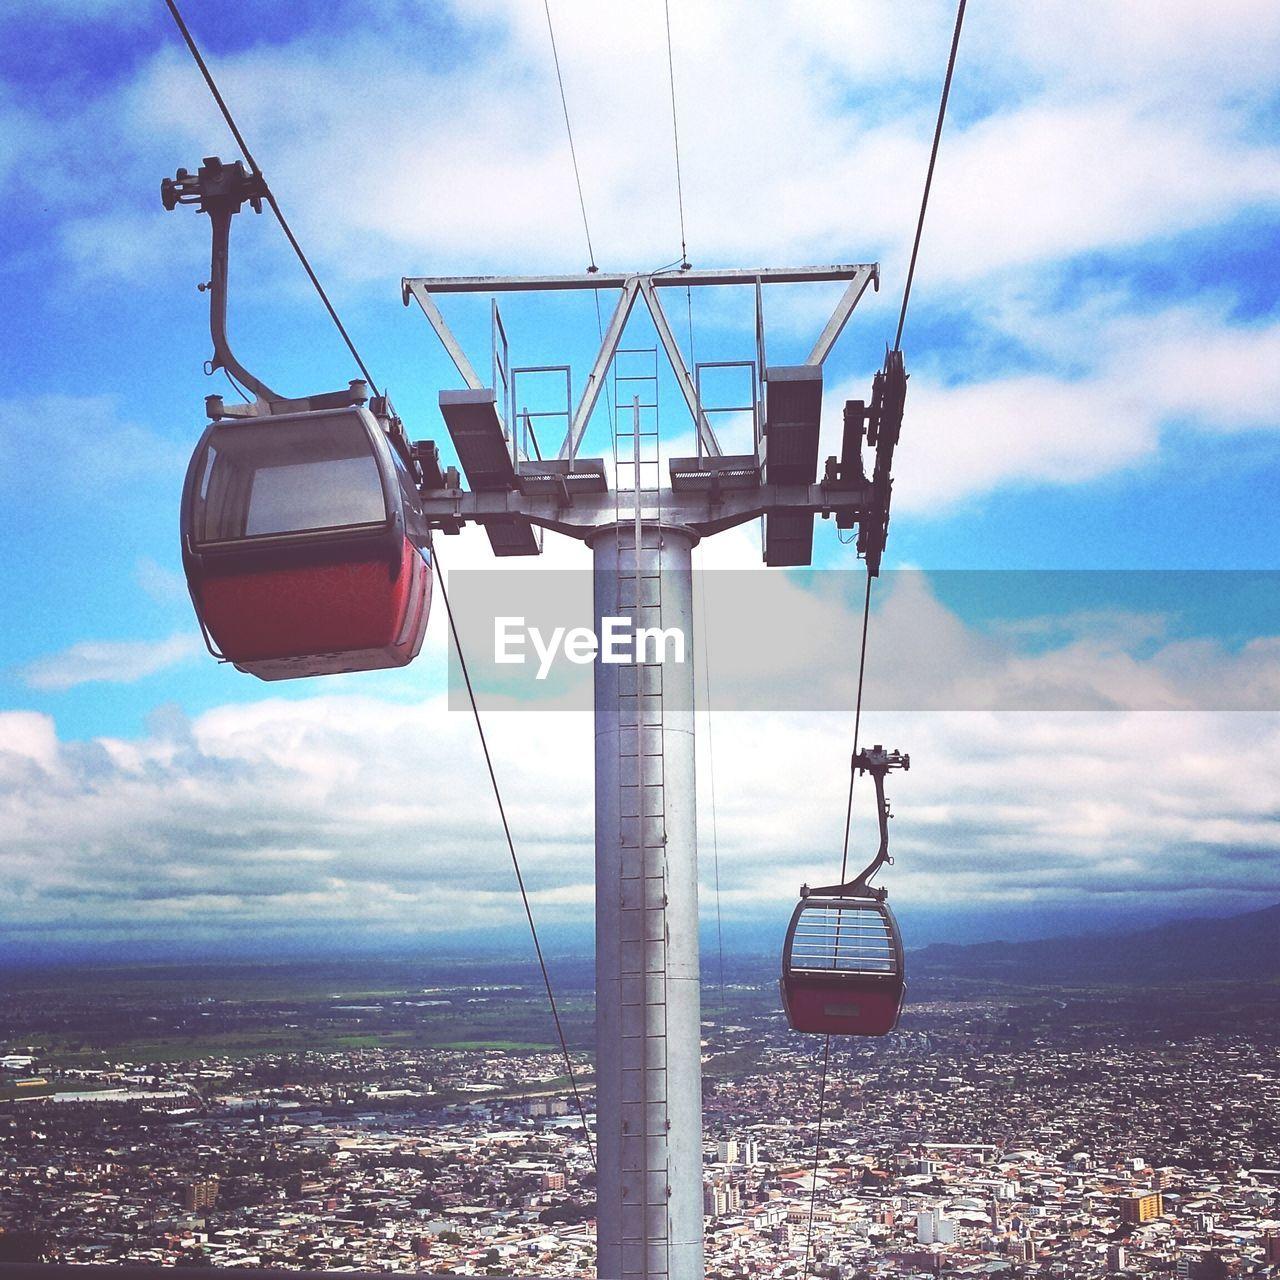 Ski lift over landscape against sky